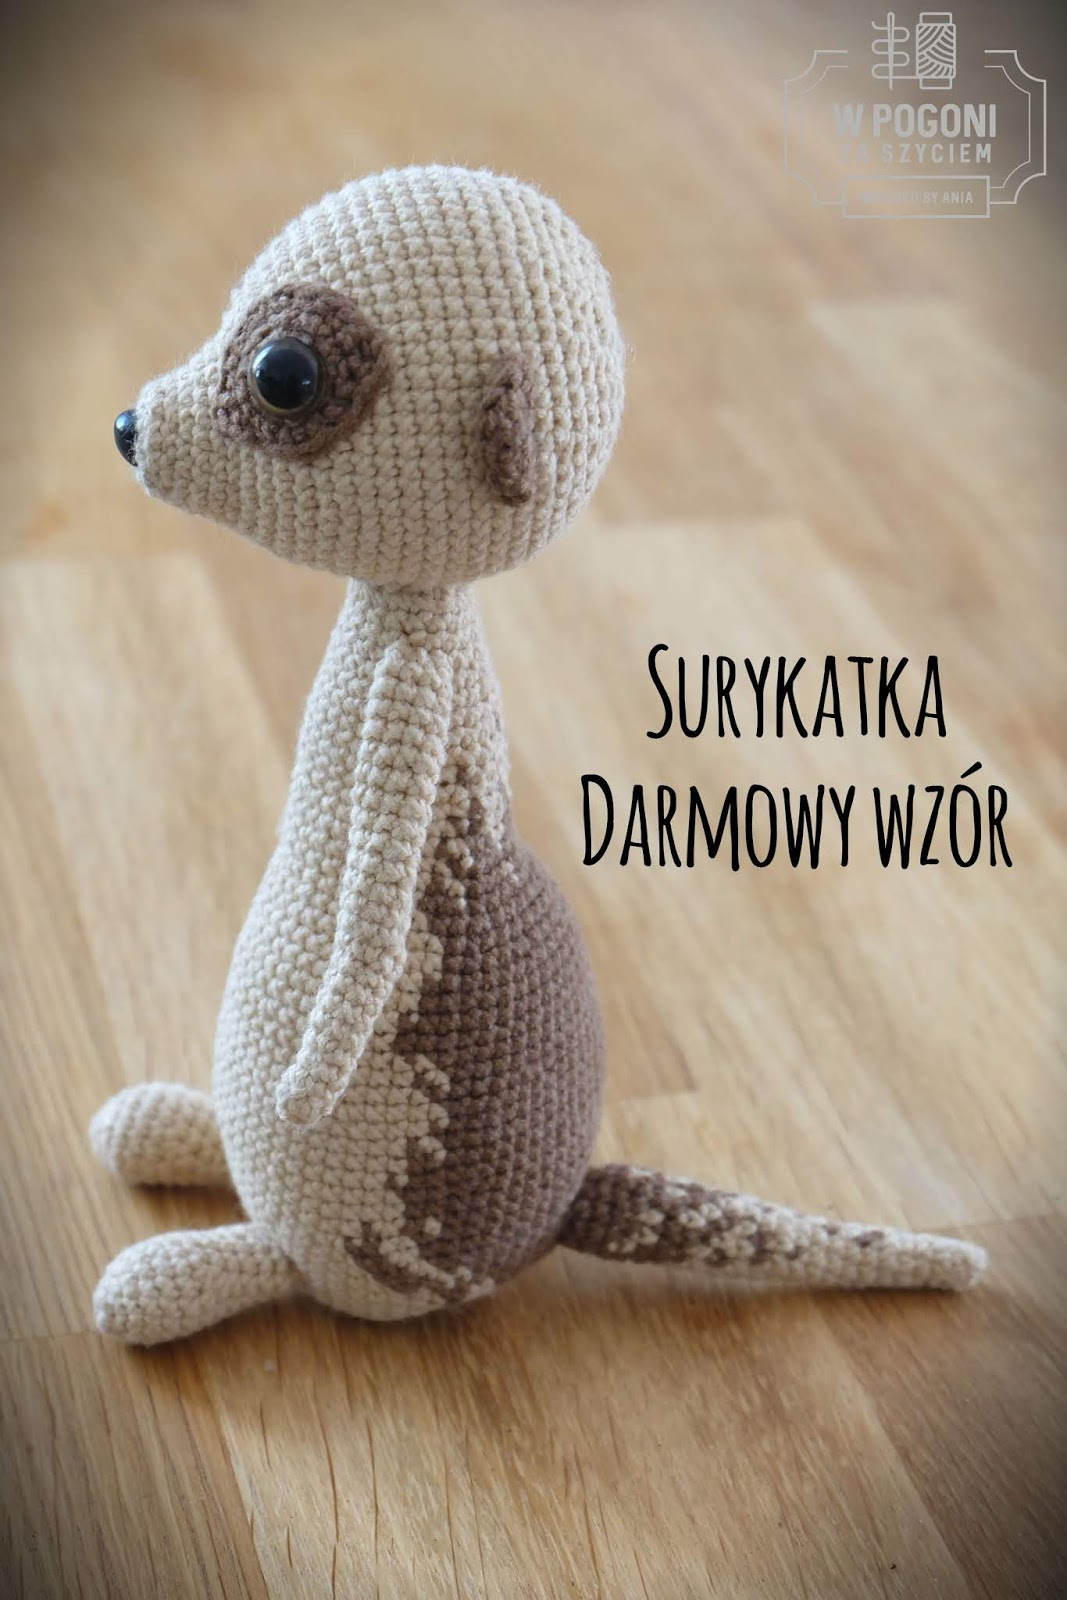 Crochet Dragon Pattern Tiny Dragon Amigurumi Pattern Amigurumi ... | 1600x1067